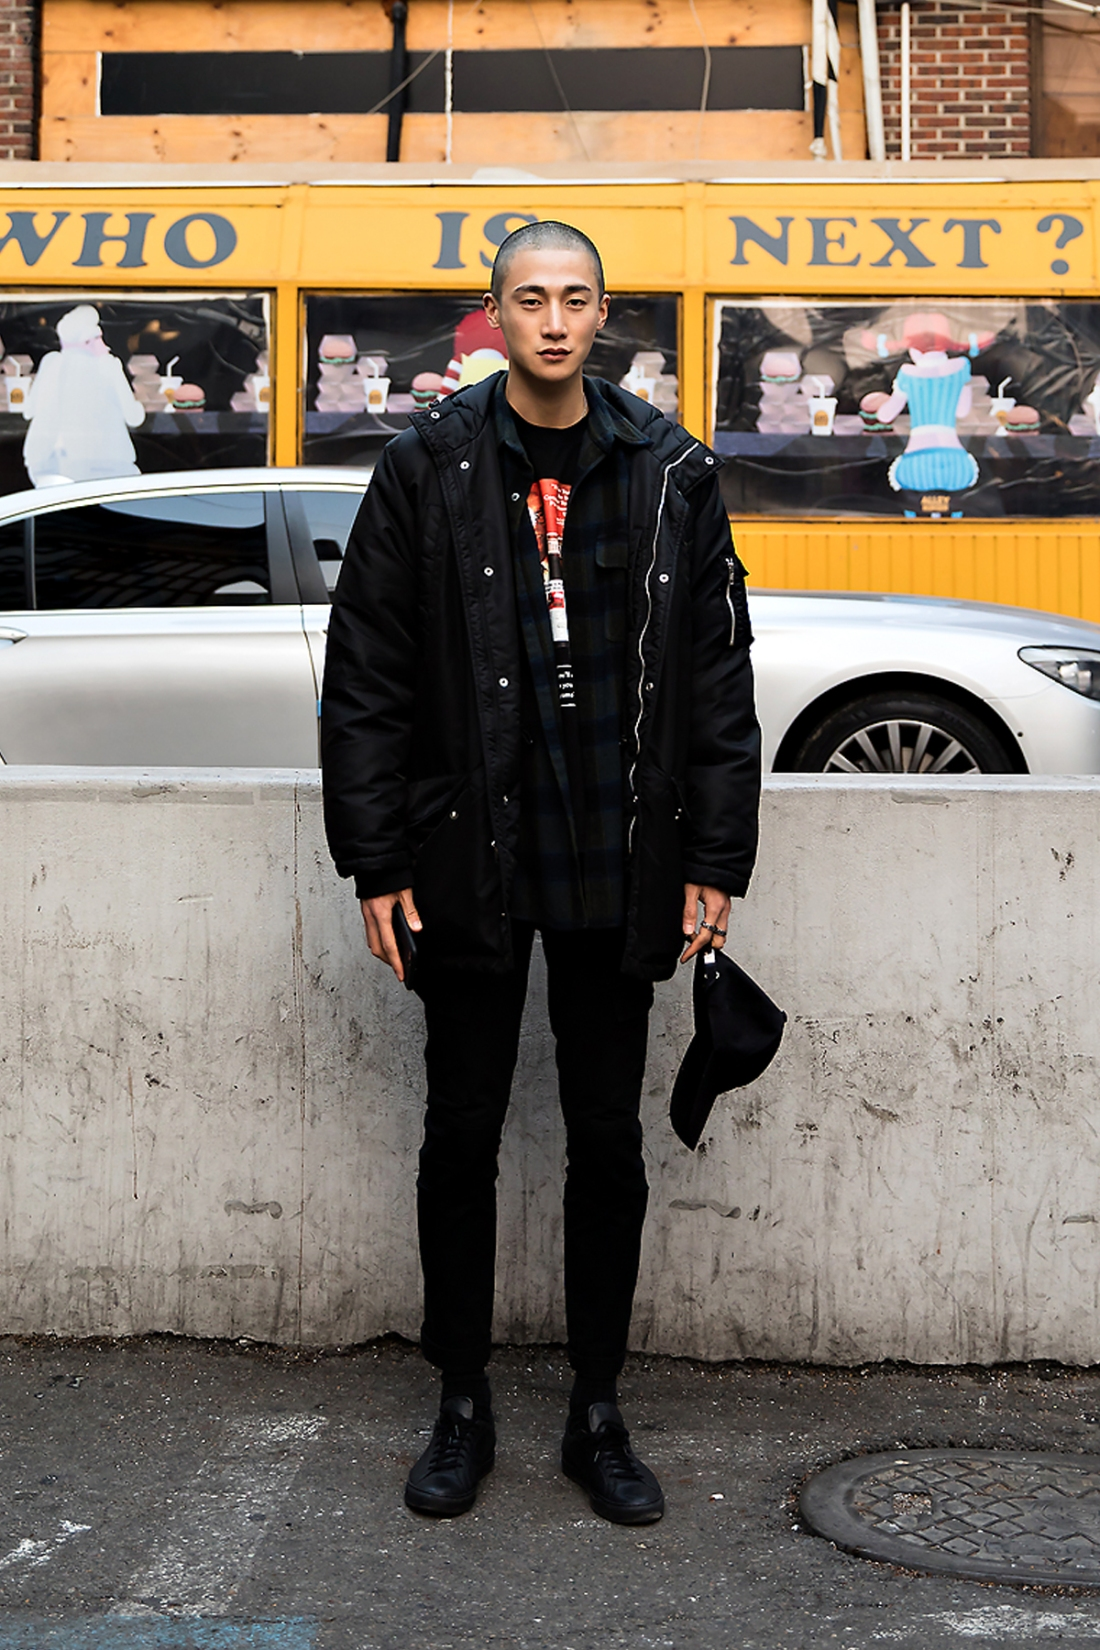 Lee Sehan, Street Fashion 2017 in SEOUL.jpg